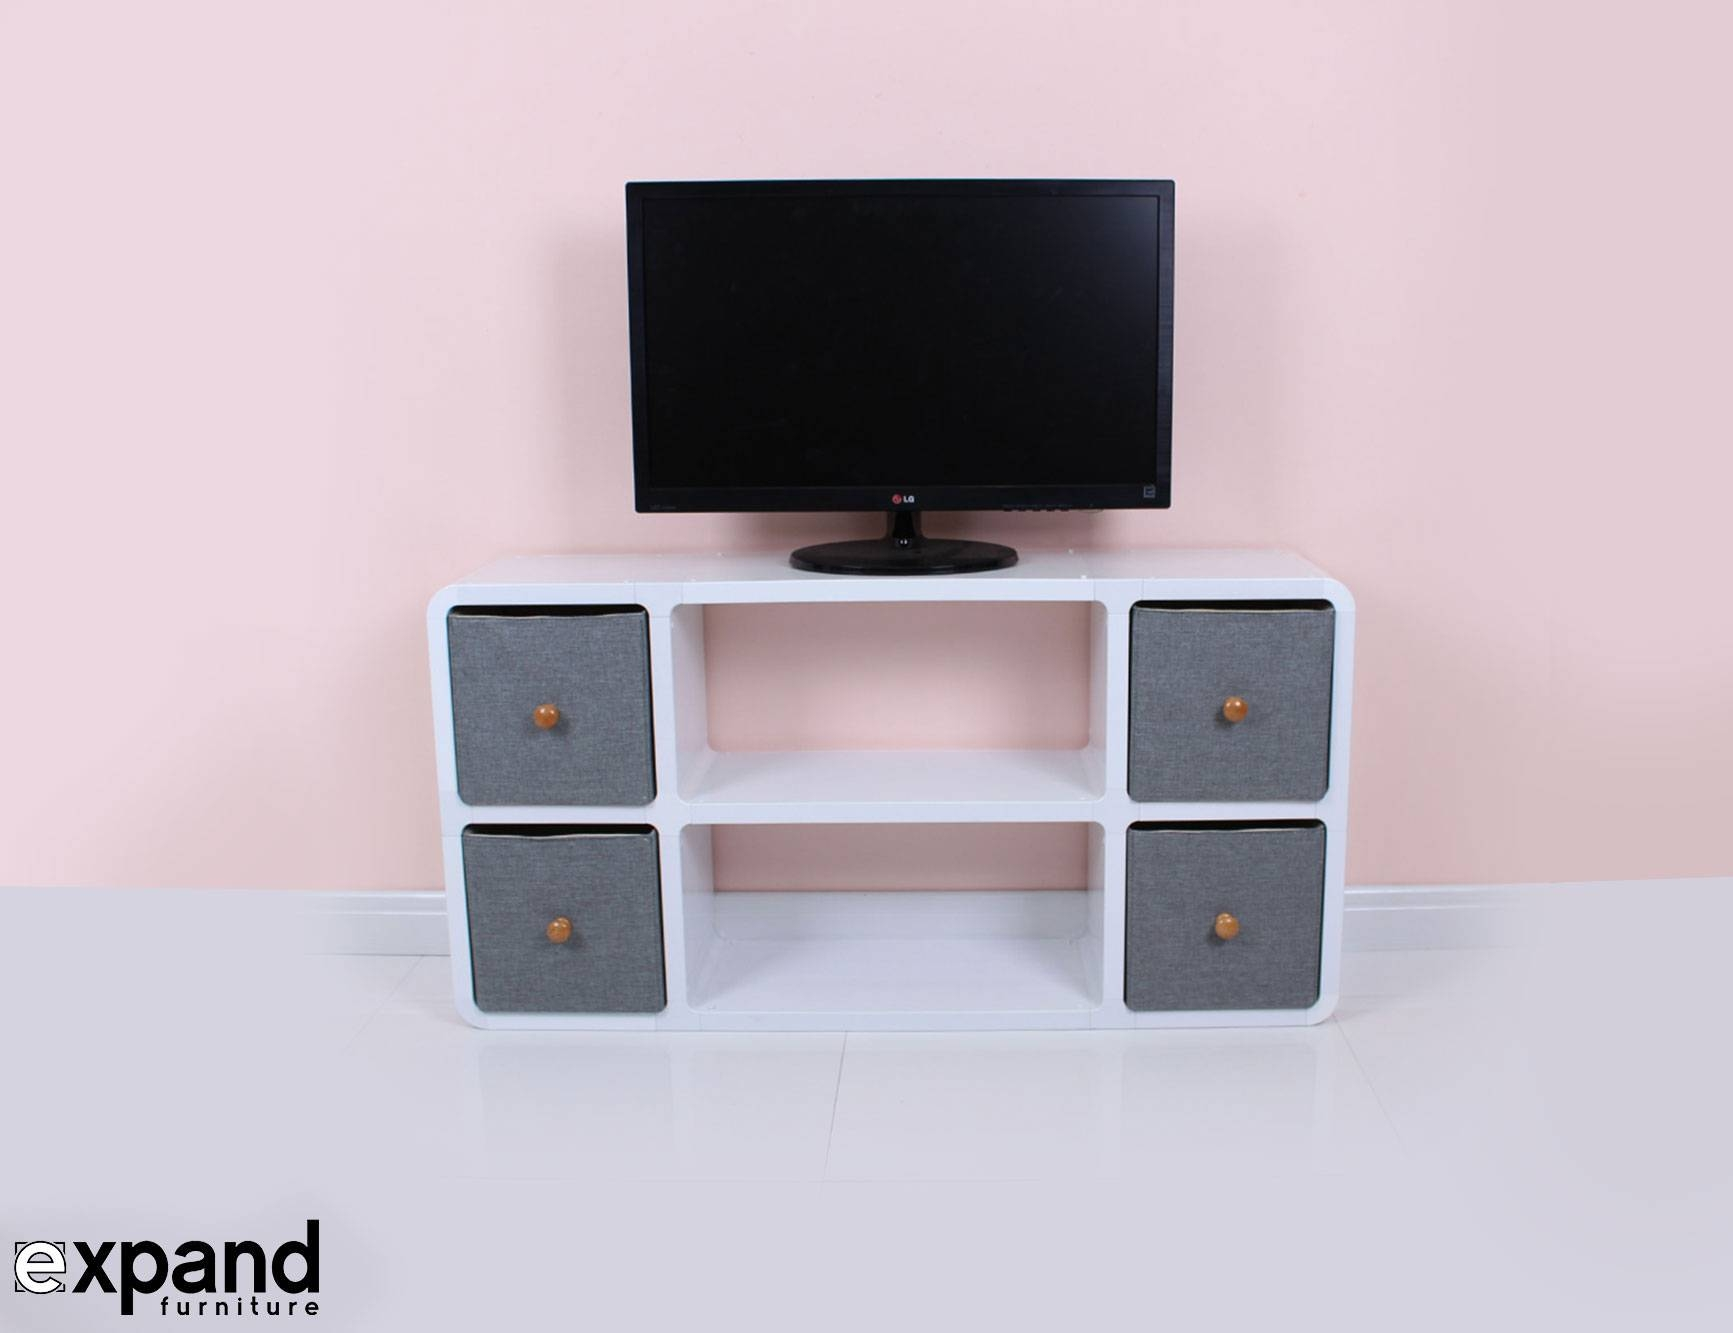 Slim Modern Tv Stand | Expand Furniture inside Slimline Tv Cabinets (Image 6 of 15)